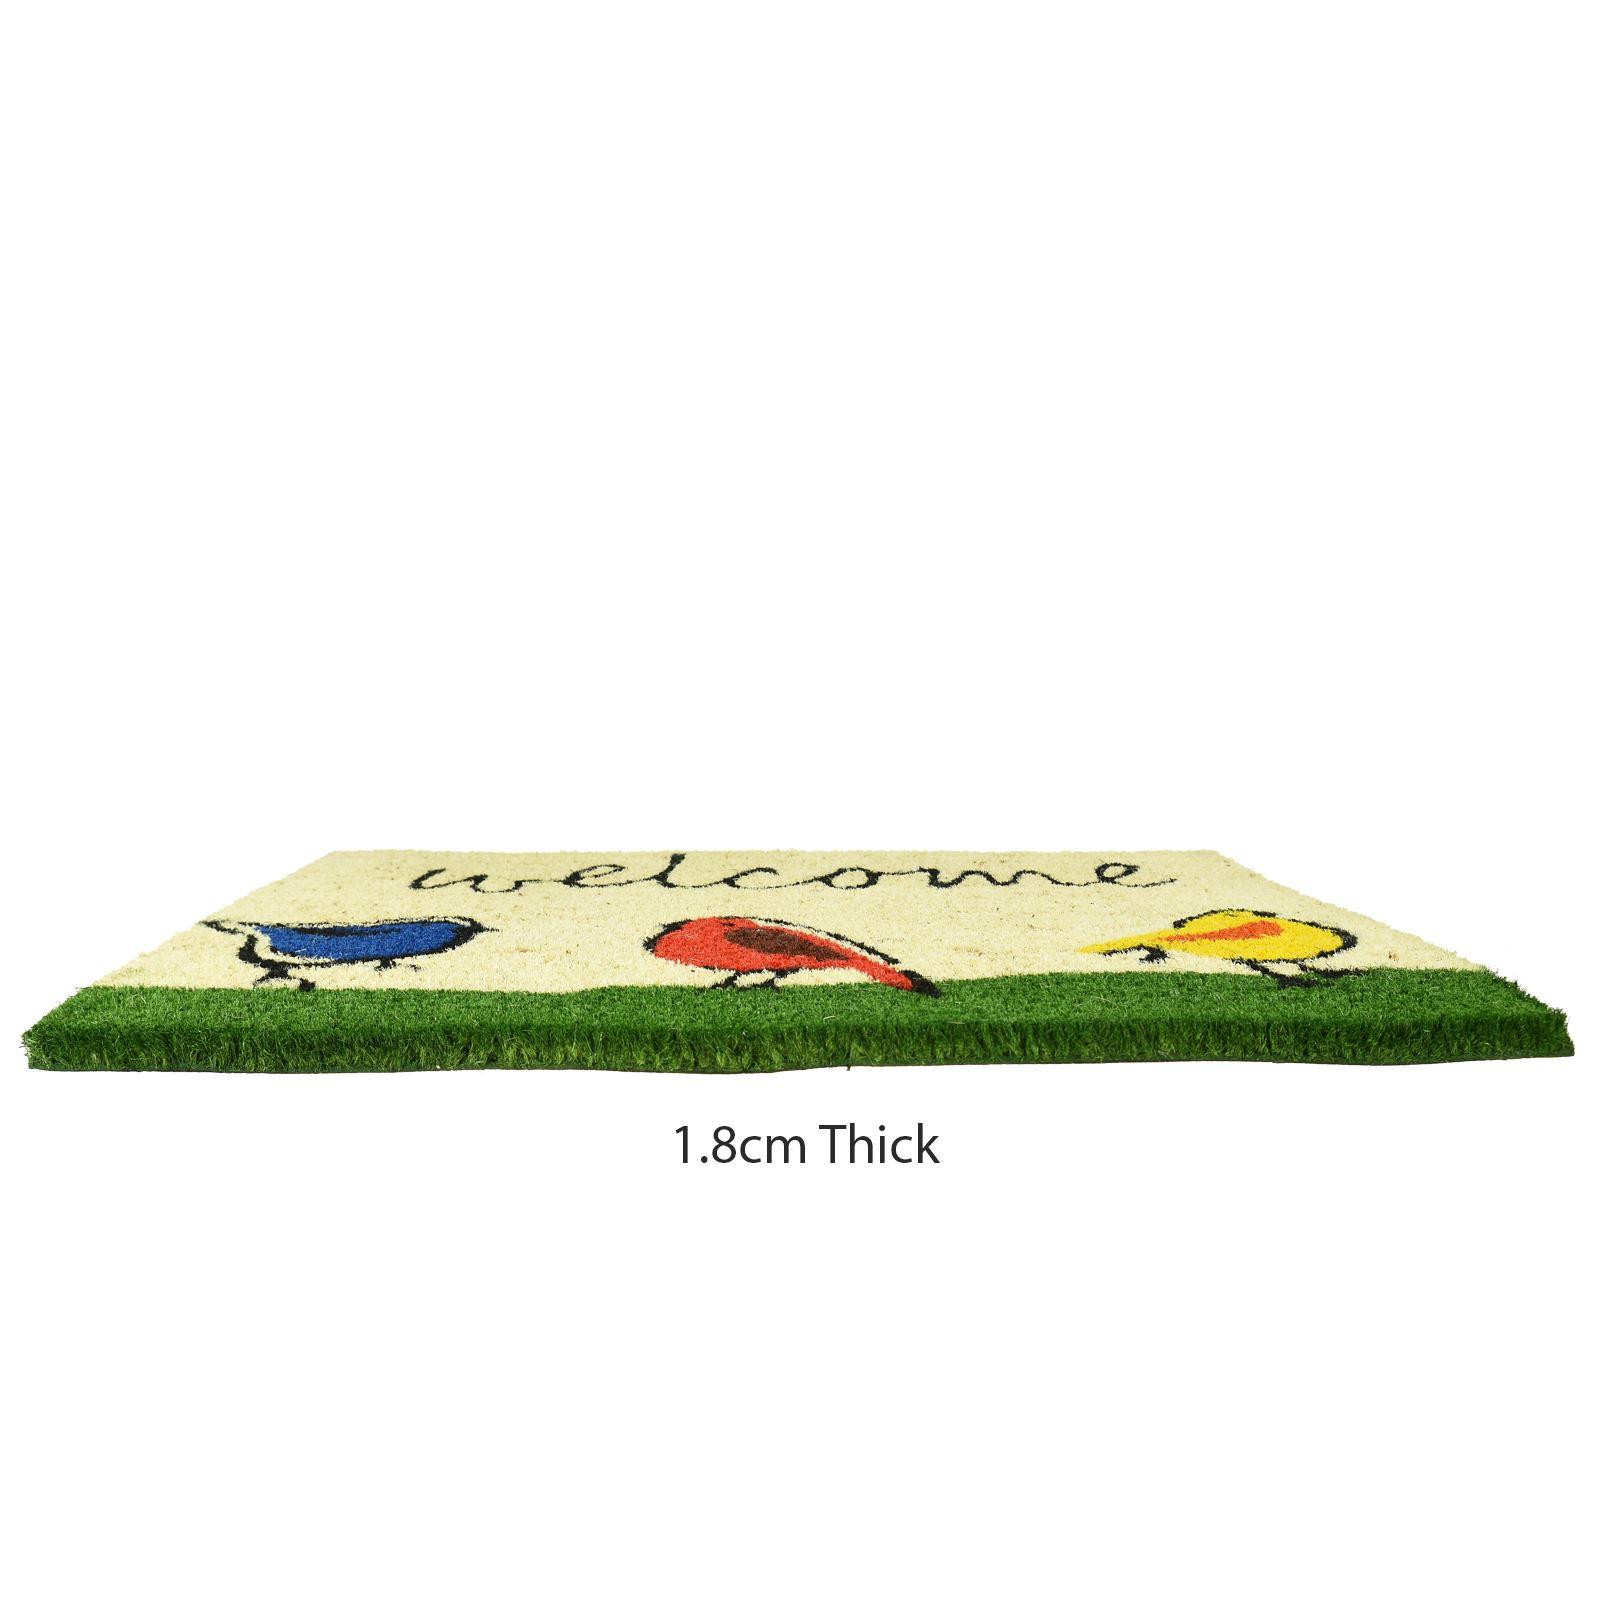 Plain-Non-Slip-Door-Mat-Tough-Natural-Coir-PVC-Back-Welcome-Doormat-40-x-60cm miniatura 12